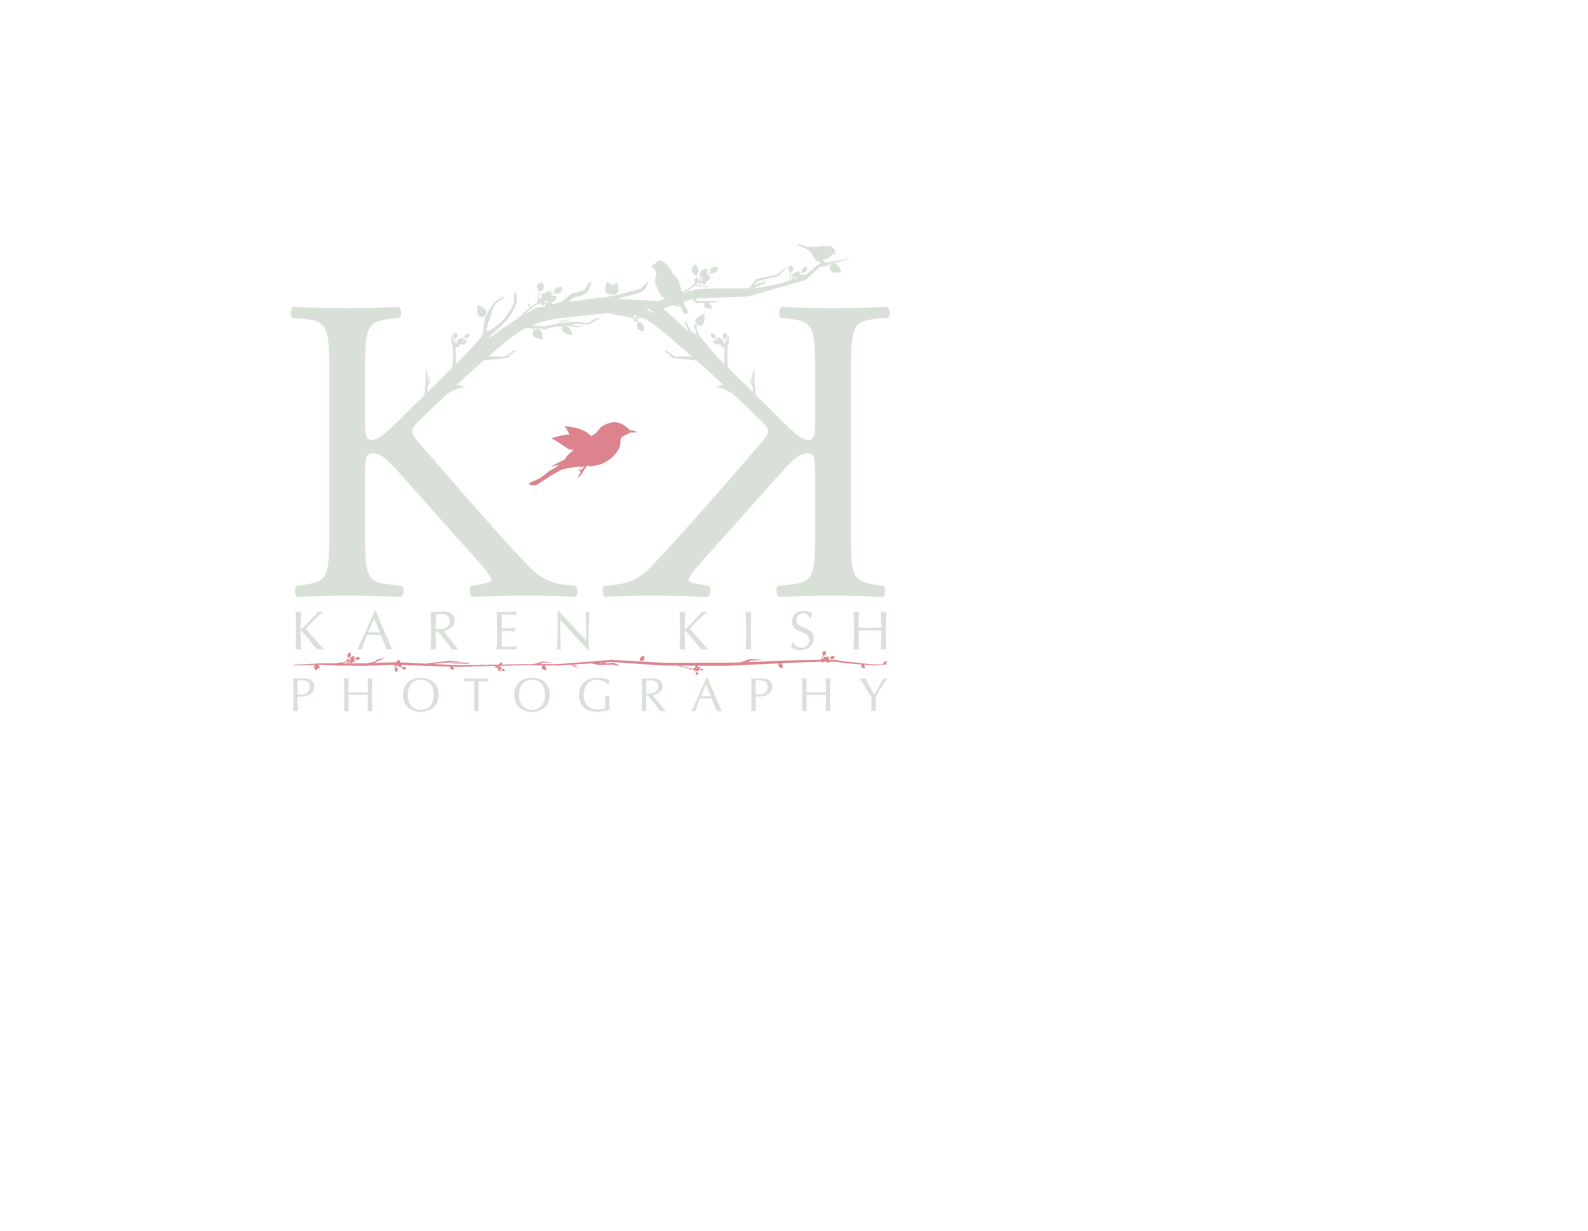 Karen Kish Photography in Metro Detroit and Michigan